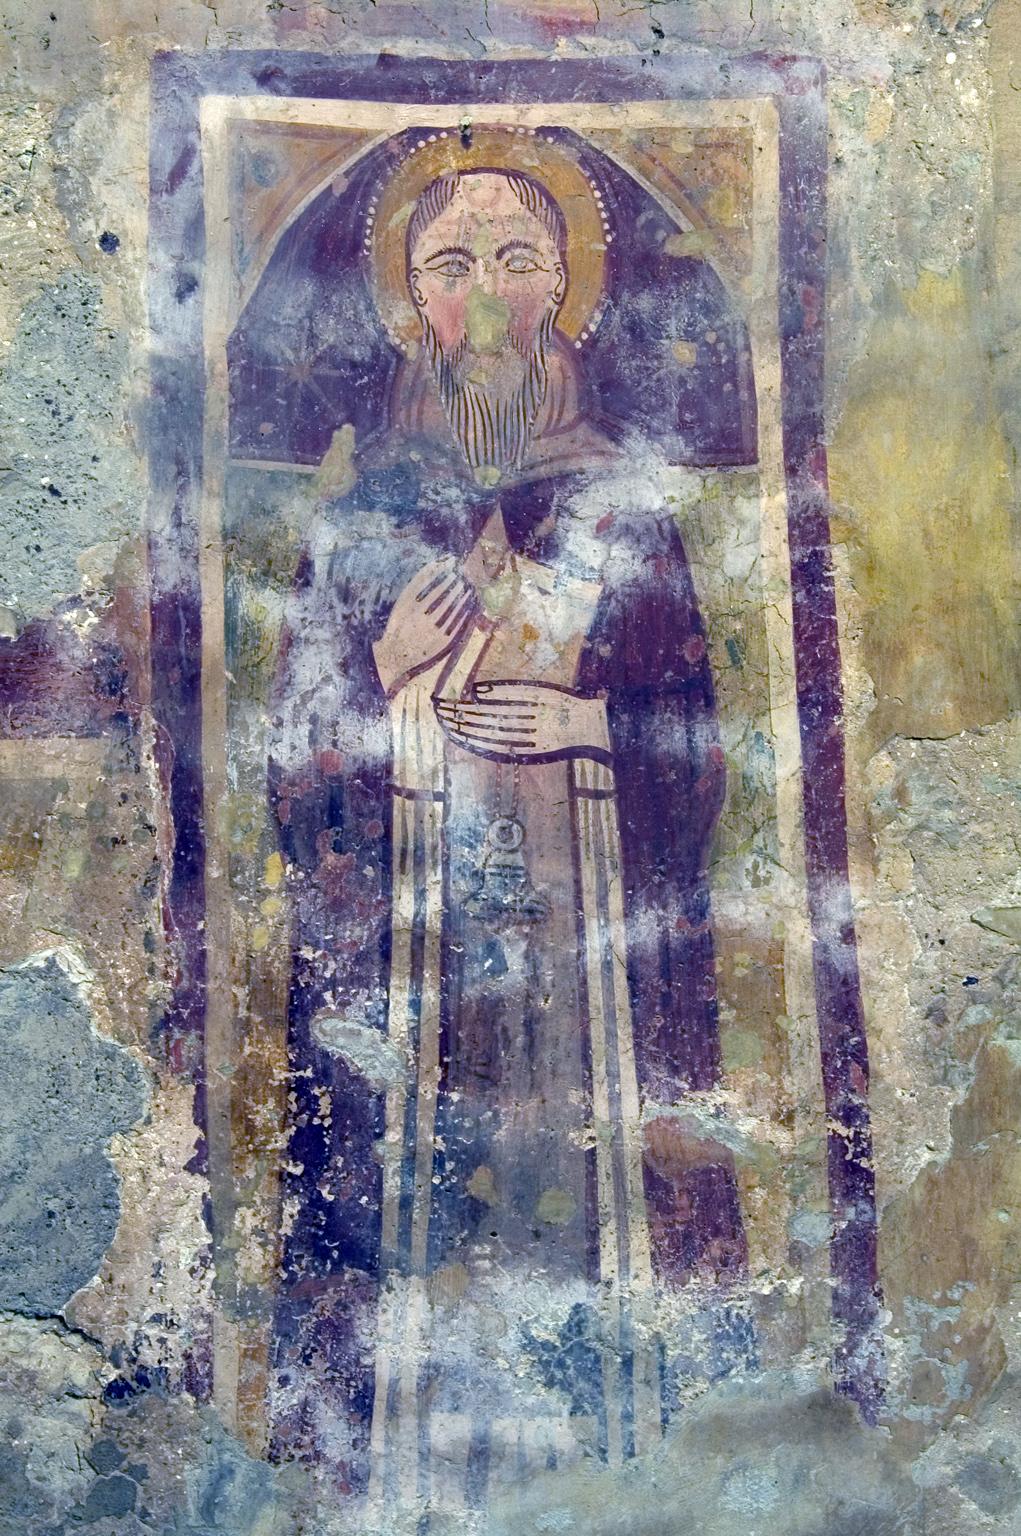 ill.21: Scuola privernate, sec. XIV, Sant'Antonio abate, affresco